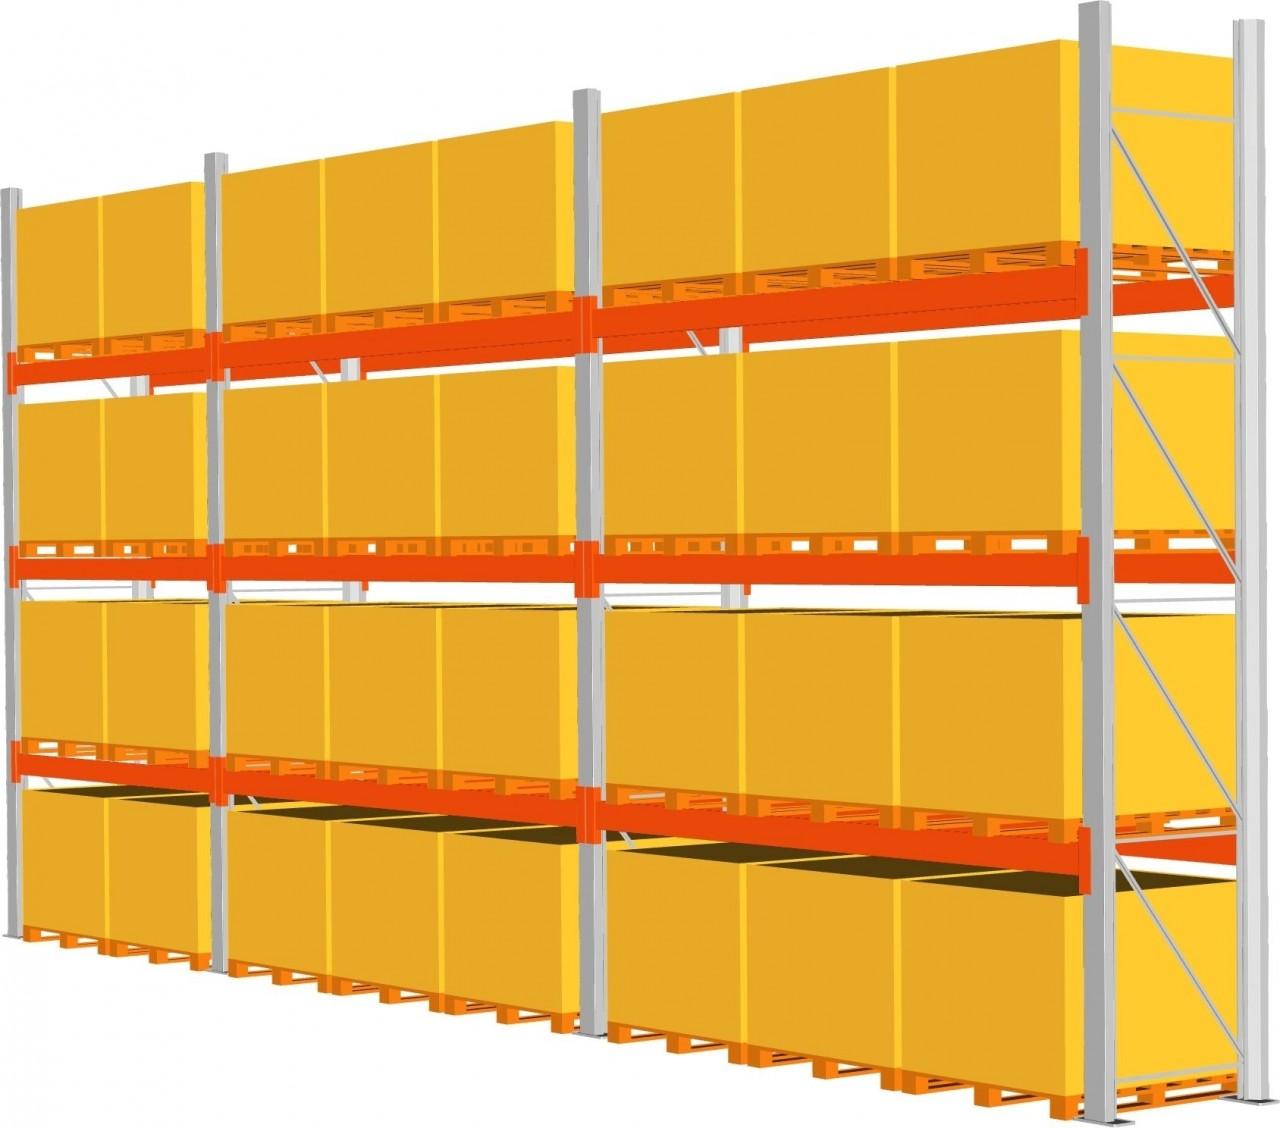 Komplettpaket Palettenregal META MULTIPAL, Paletten bis 1000 kg, HxT 4400x1100mm,